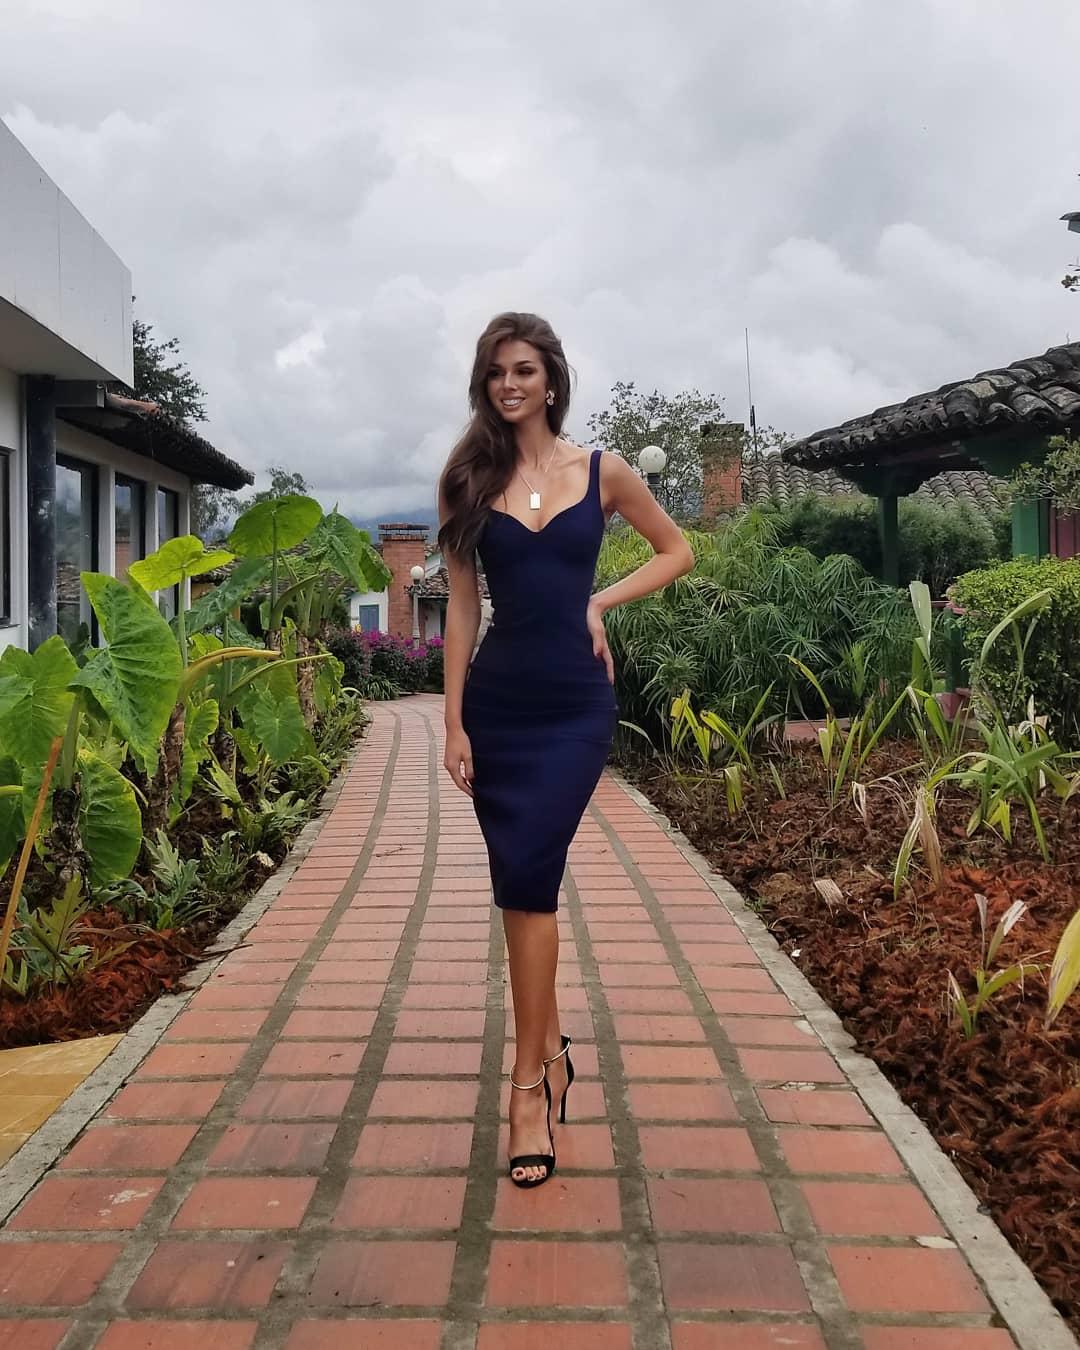 miss universe canada 2018, top 10 de mu 2018, esta em colombia. Vebagoew